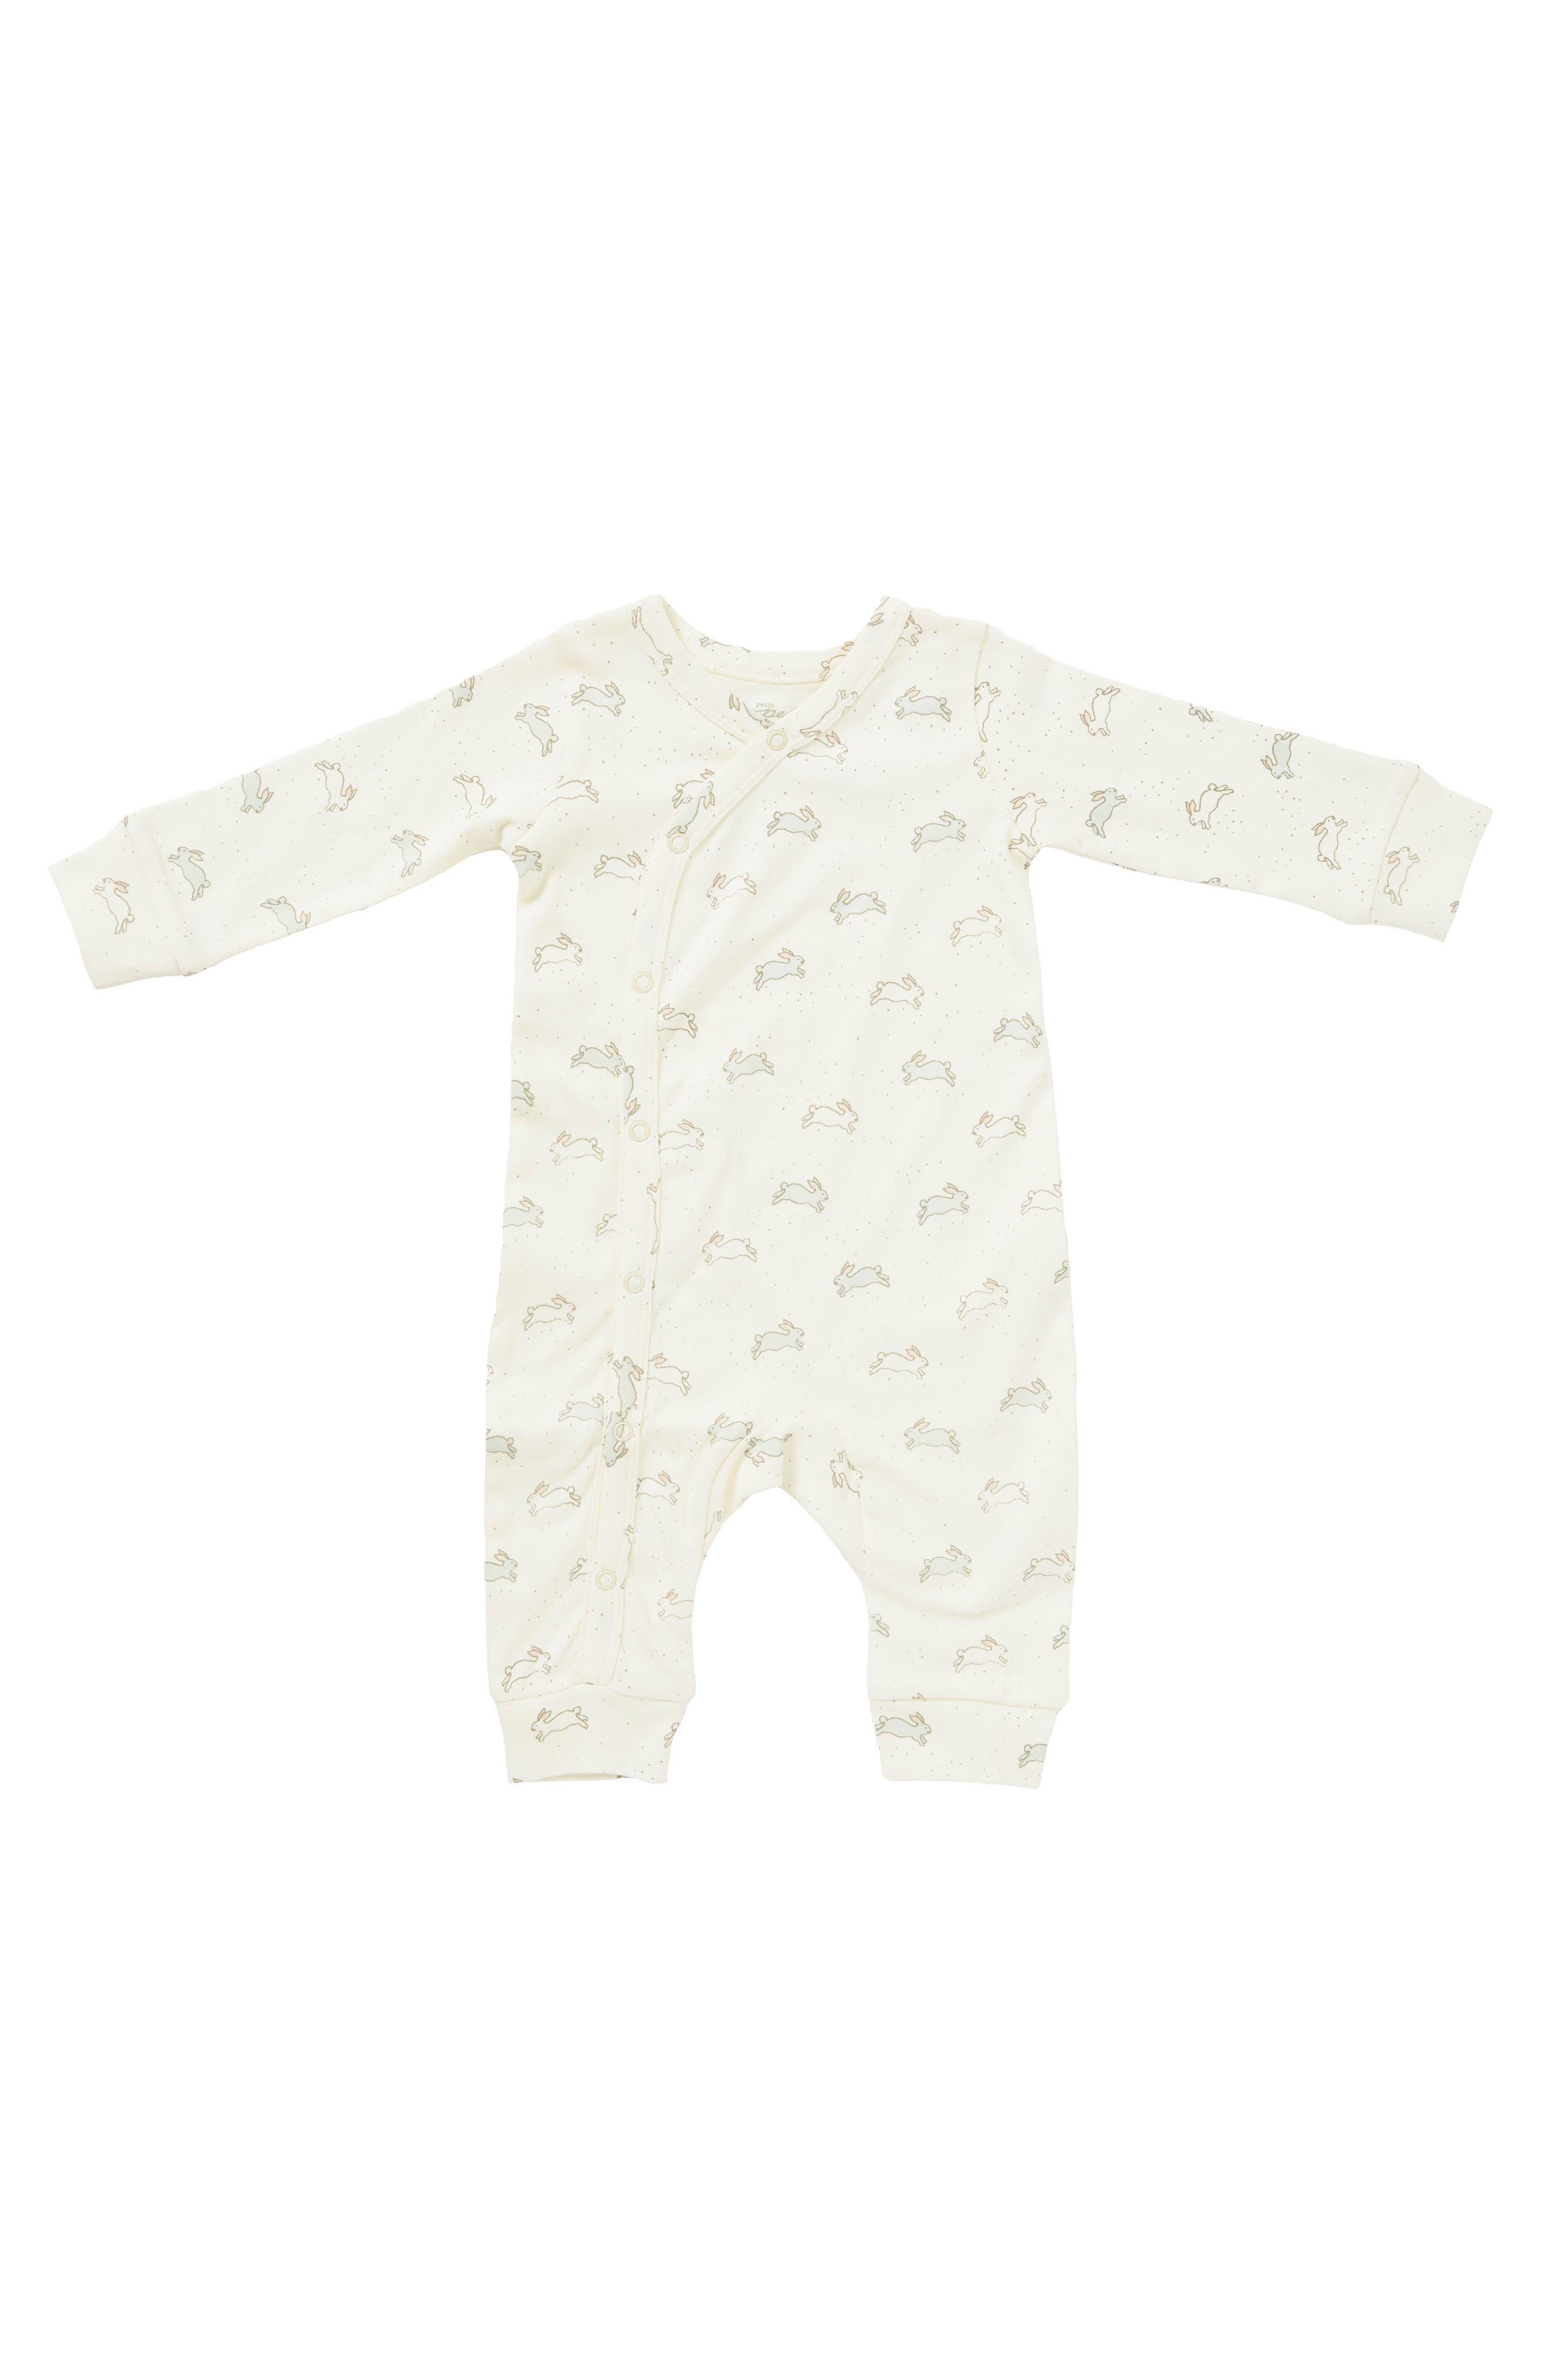 Main Image - Petit Pehr Tiny Bunny Romper (Baby)